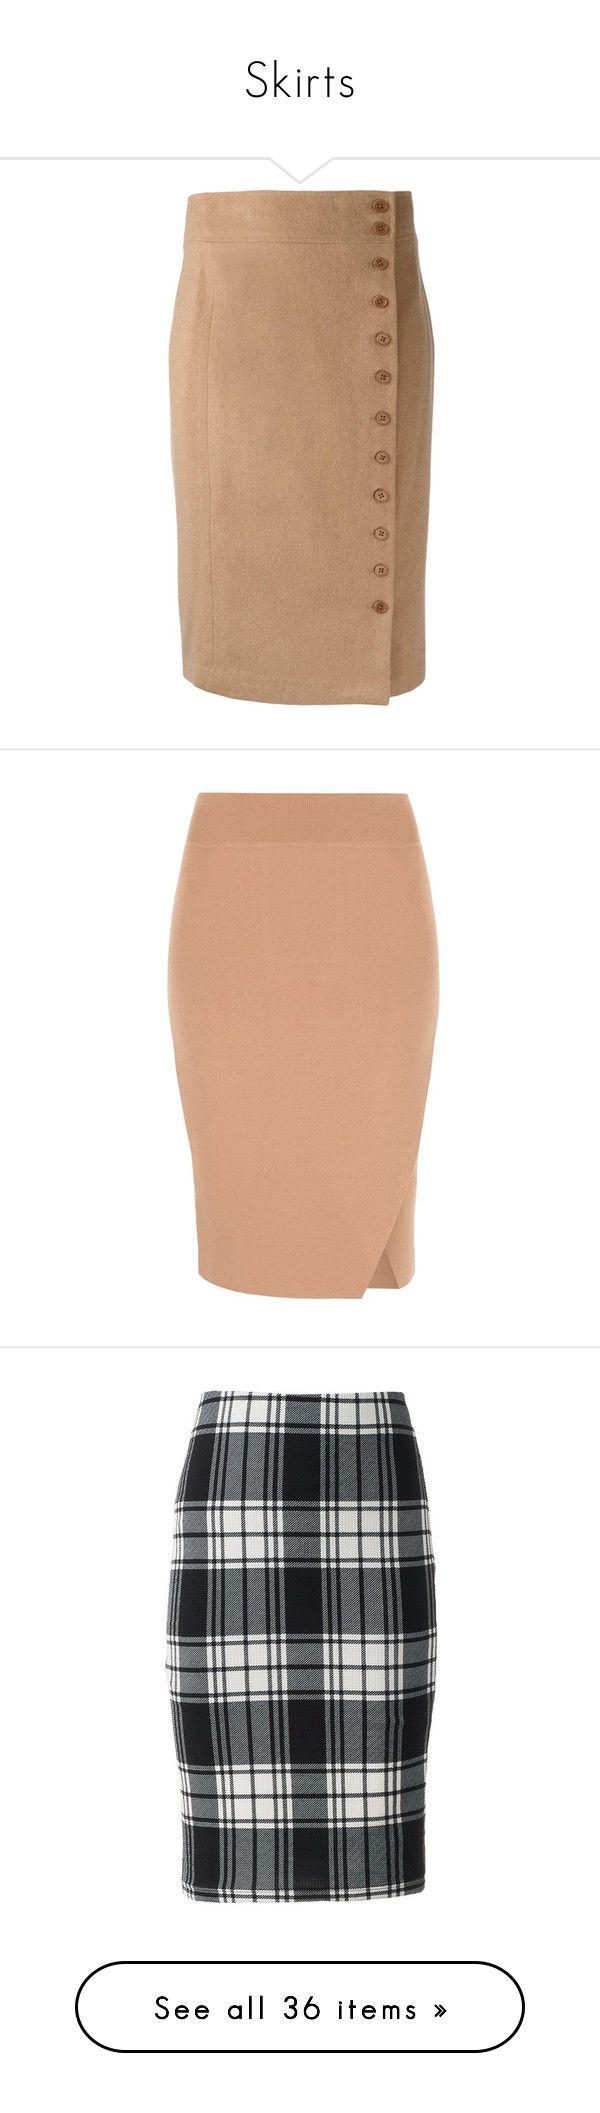 """Skirts"" by klm62 ❤ liked on Polyvore featuring skirts, brown, camel pencil skirt, knee length pencil skirt, brown skirt, polo ralph lauren, beige skirt, slit pencil skirt, mid calf pencil skirt and red midi skirt"